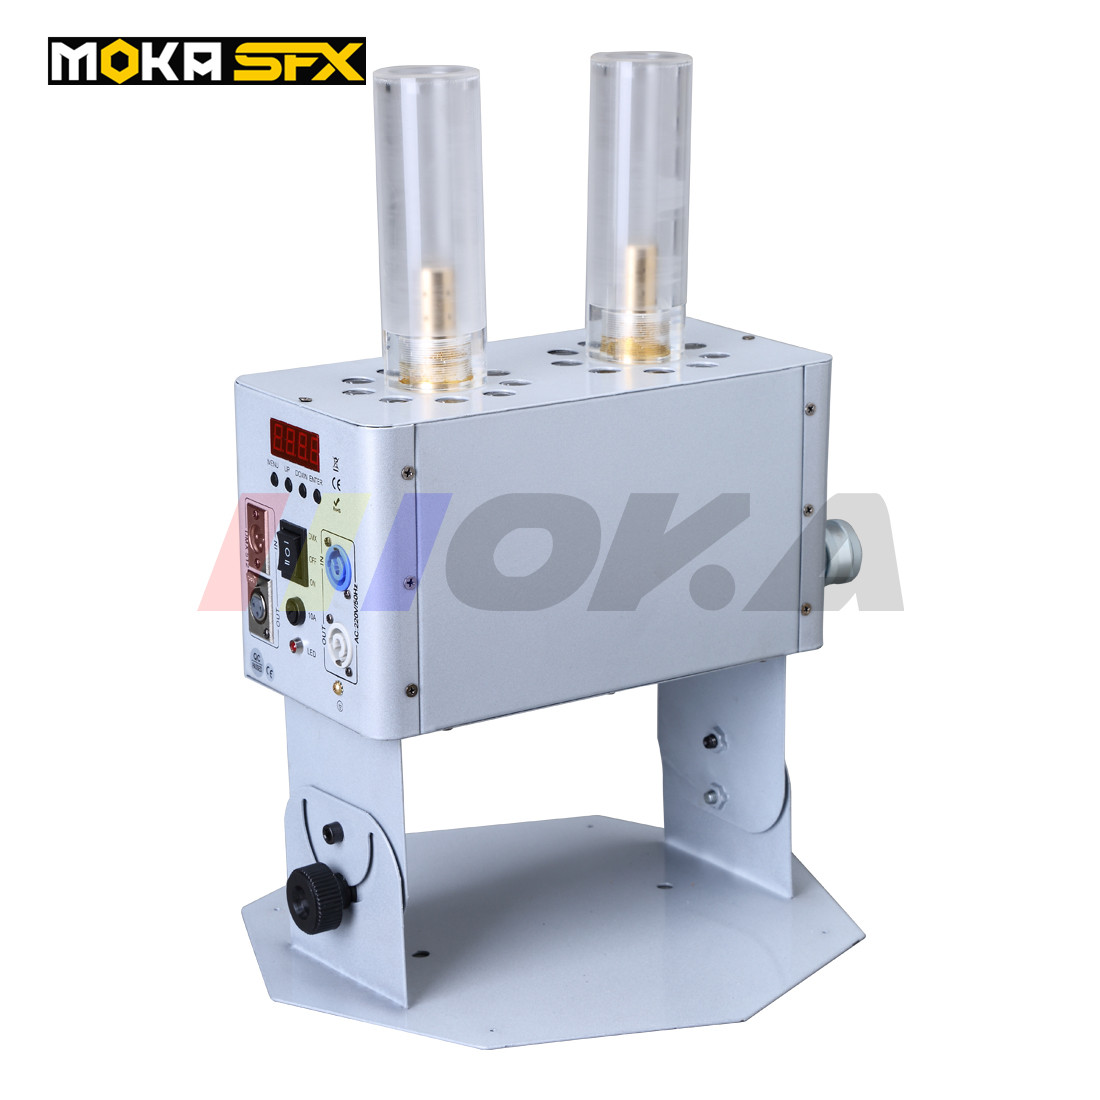 Stage DMX 512 double tube LED CO2 Jet Machine Cryo Effets Anges libres tir 8-12 mètres LED CO2 Jet Device